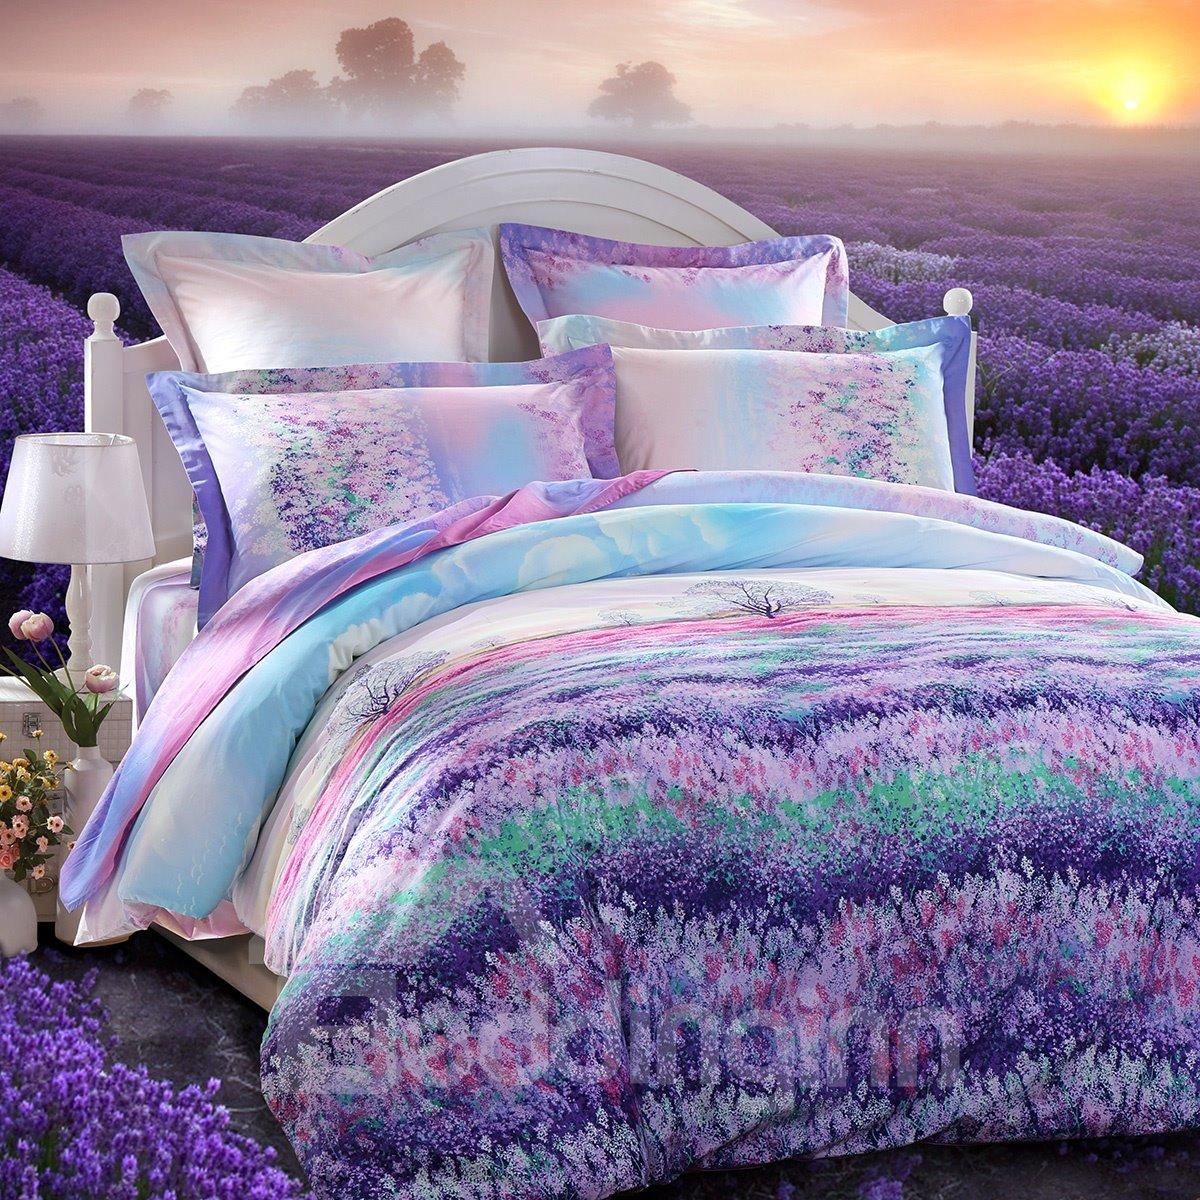 Beautiful Lavender Garden Printing 3 Piece Cotton Duvet